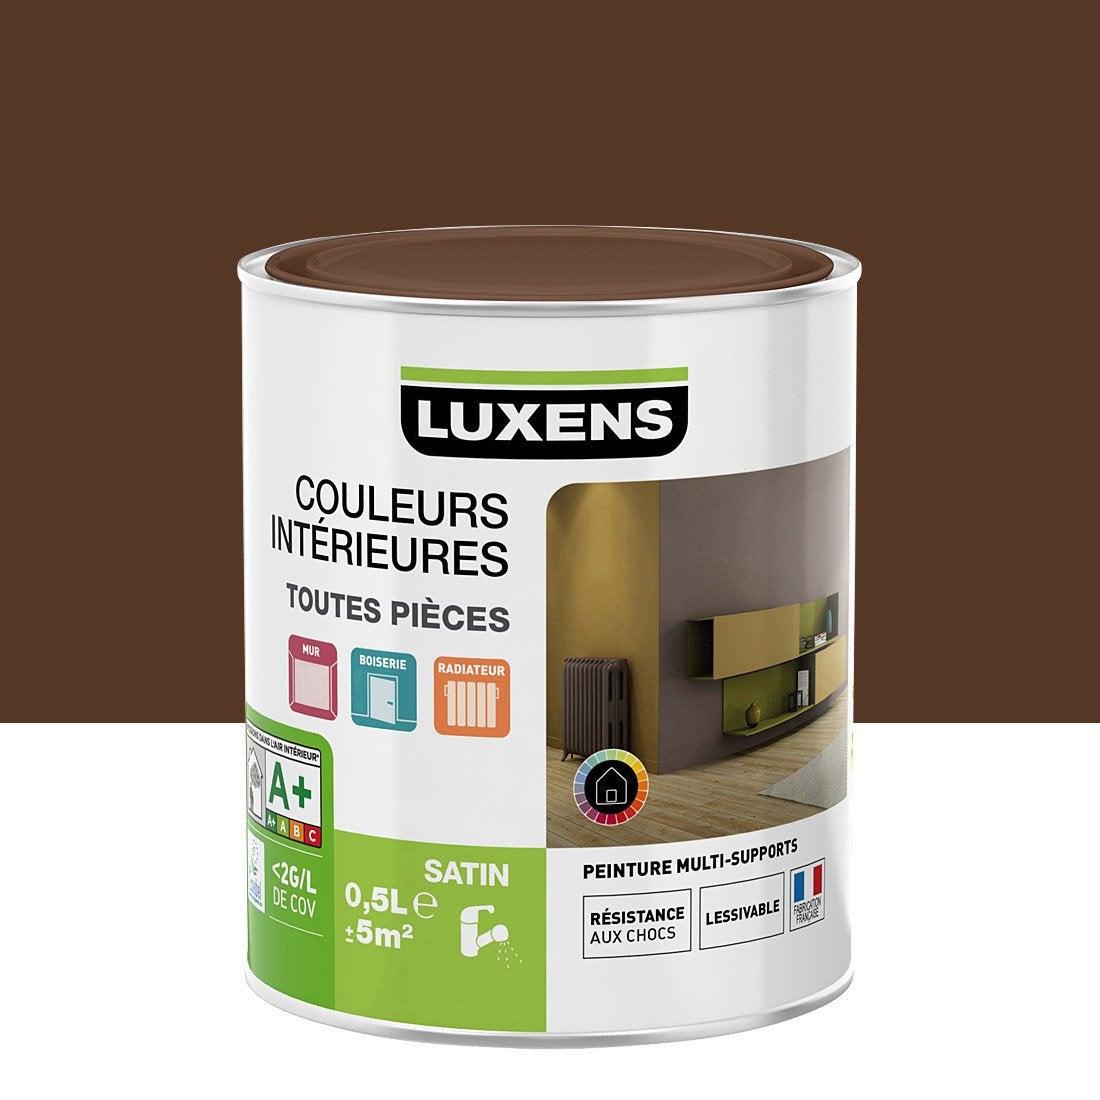 Peinture brun chocolat 2 luxens couleurs int rieures satin for Peinture bio leroy merlin